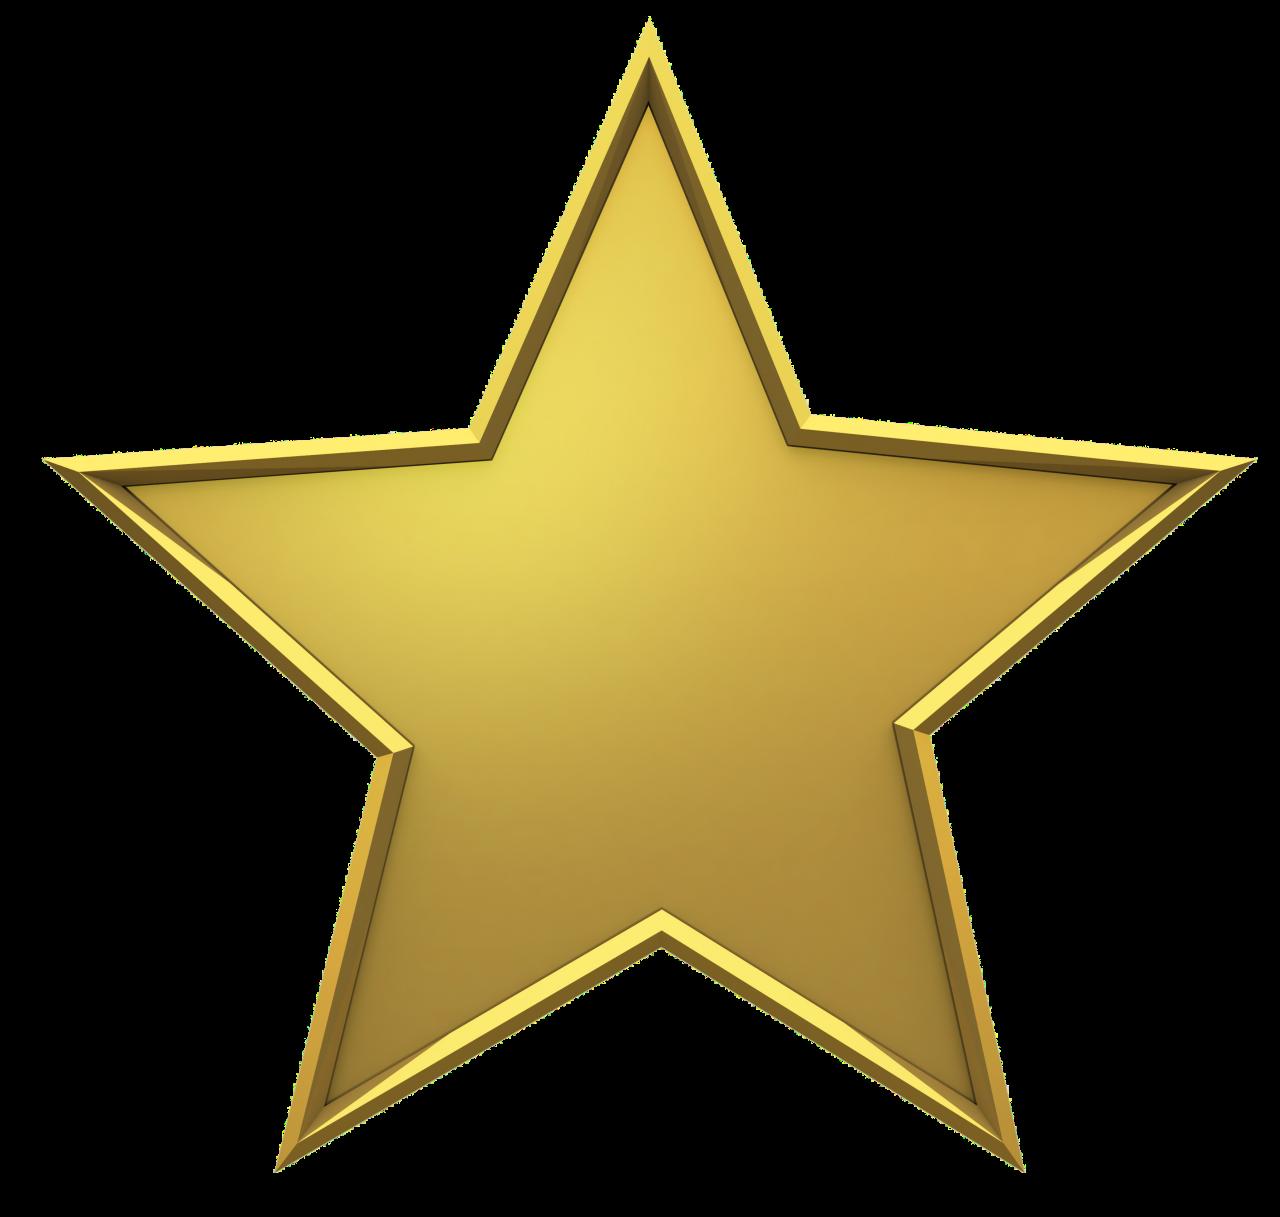 Golden Christmas Star PNG Image